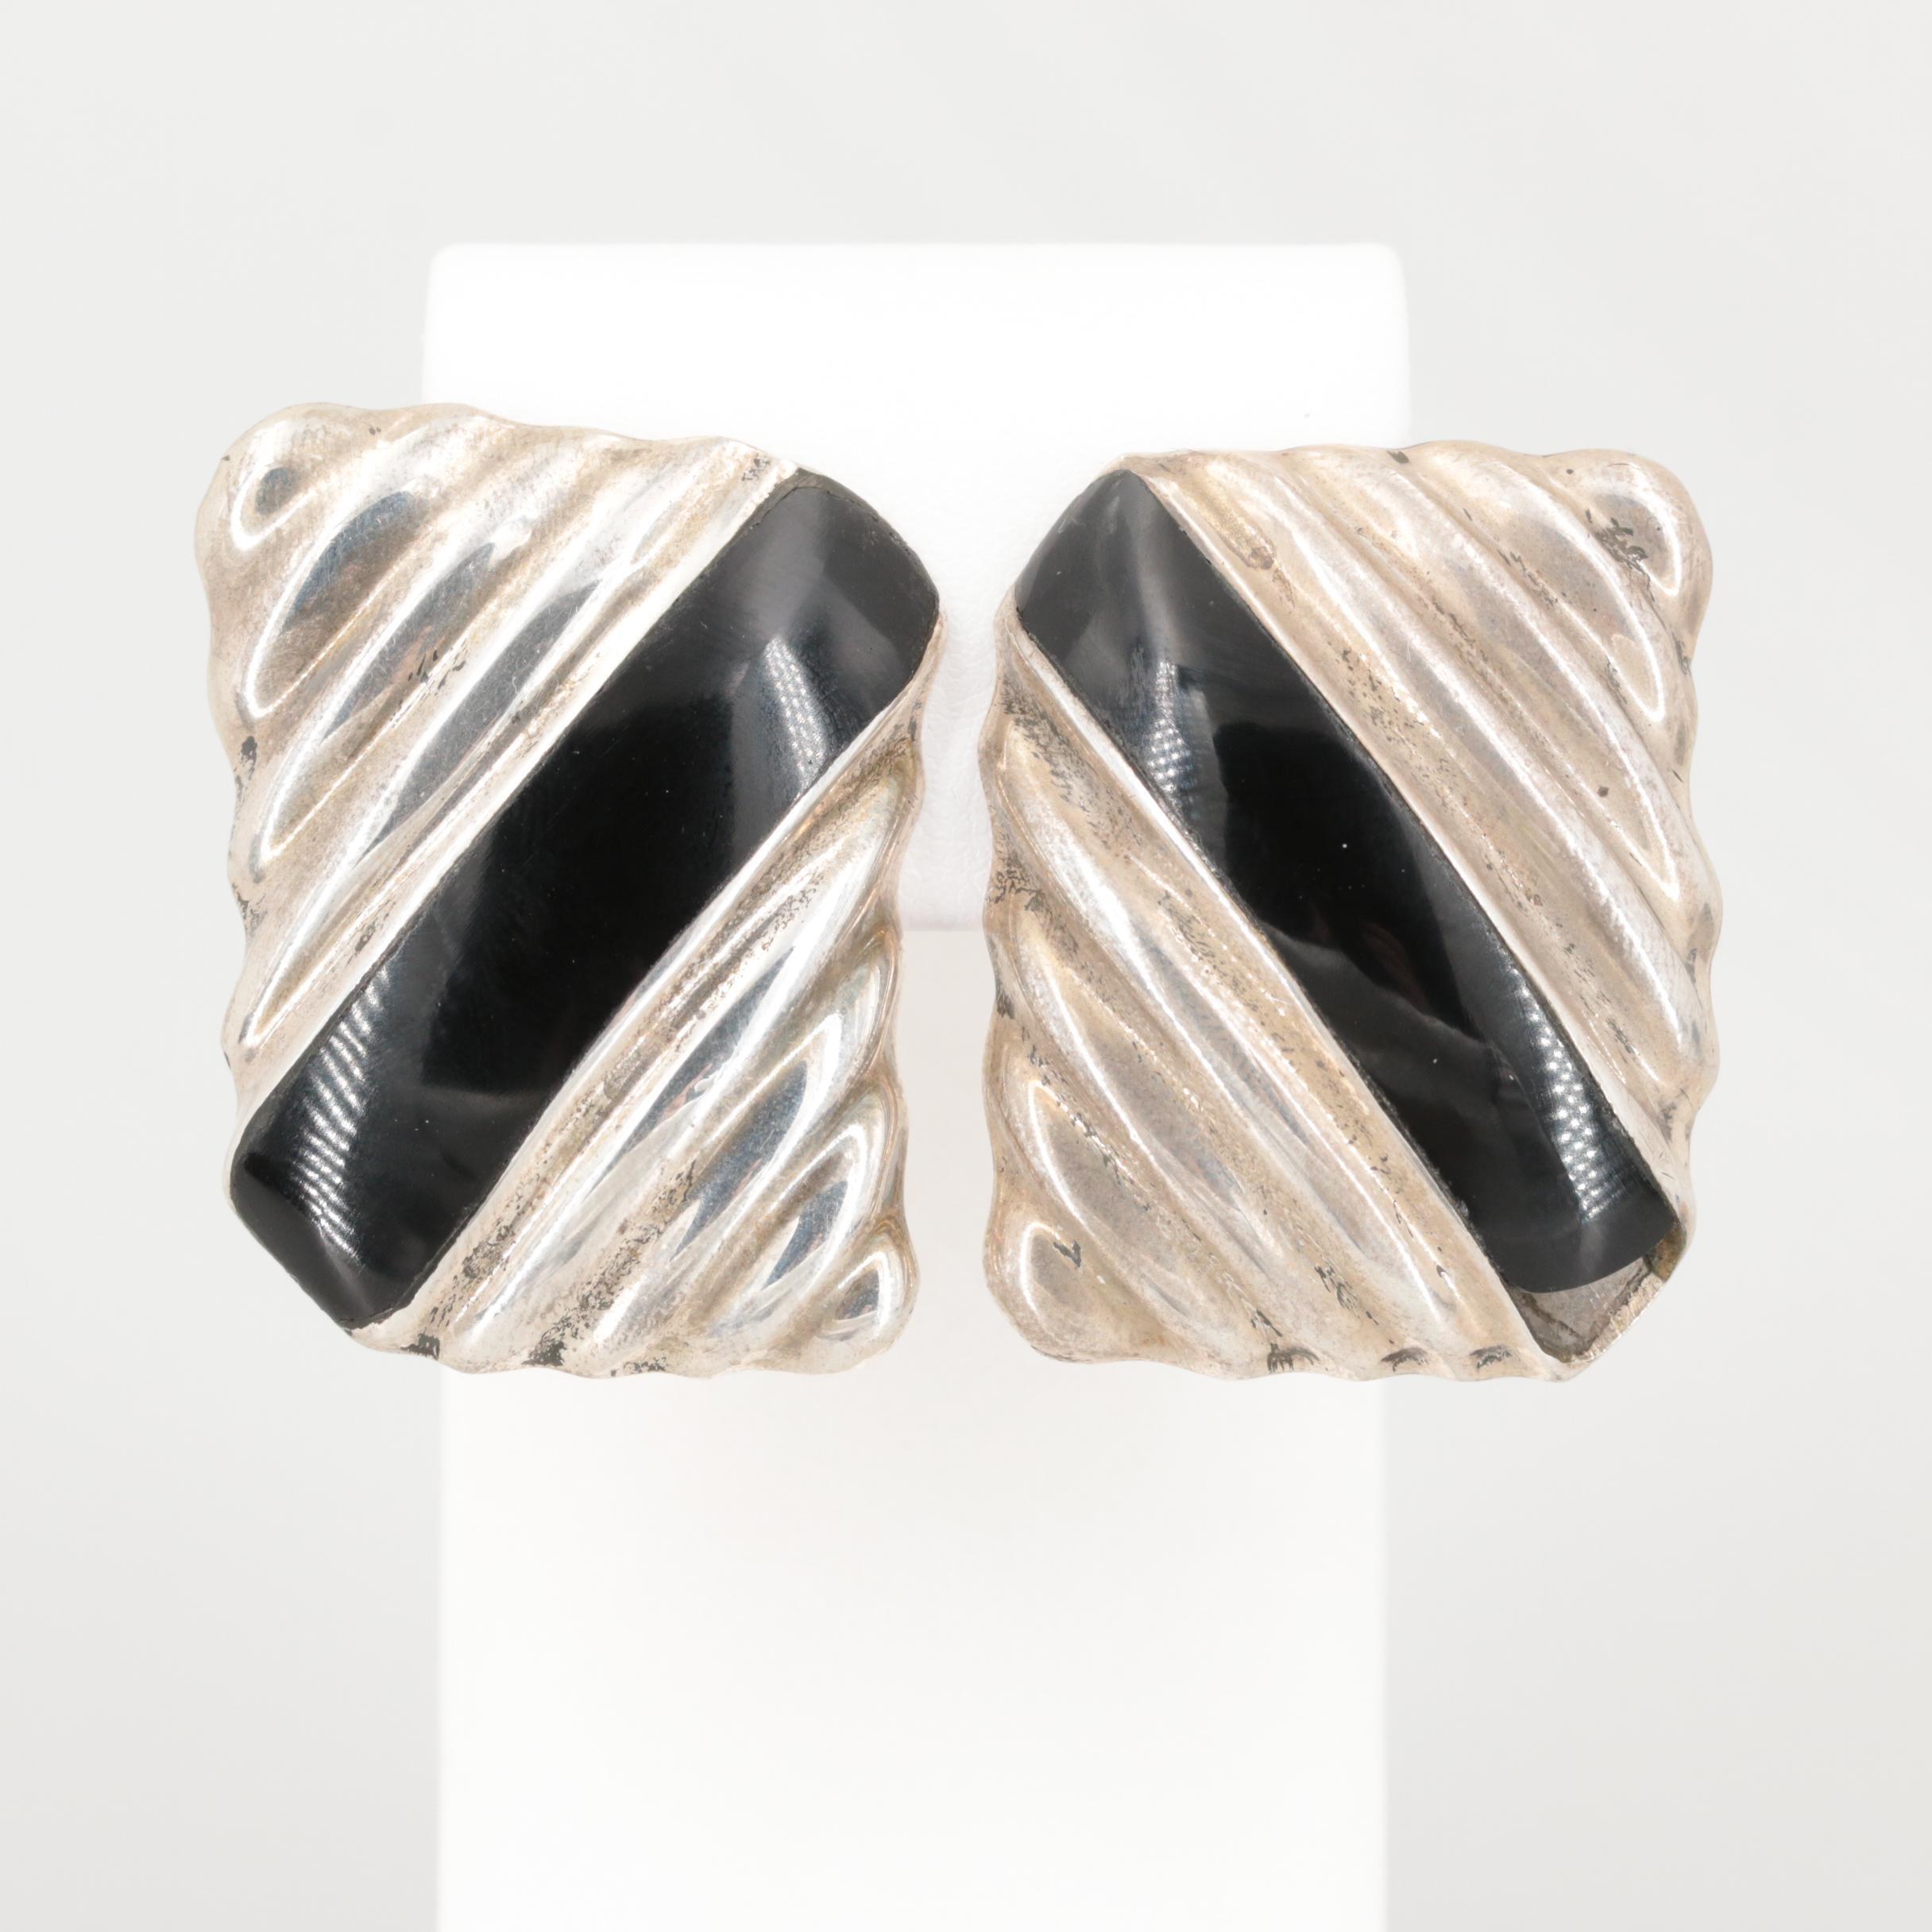 Mexican Sterling Silver Black Onyx Earrings